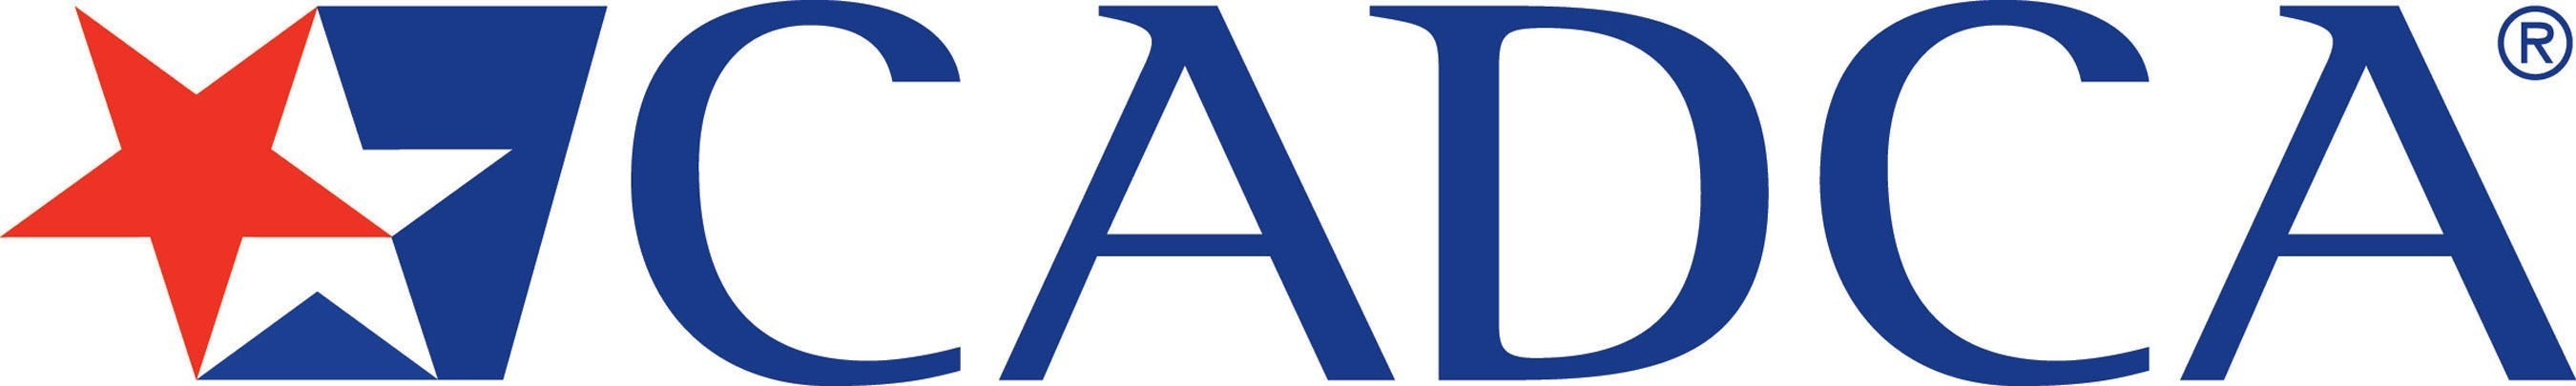 CADCA (Community Anti-Drug Coalitions of America) logo. (PRNewsFoto/CADCA)